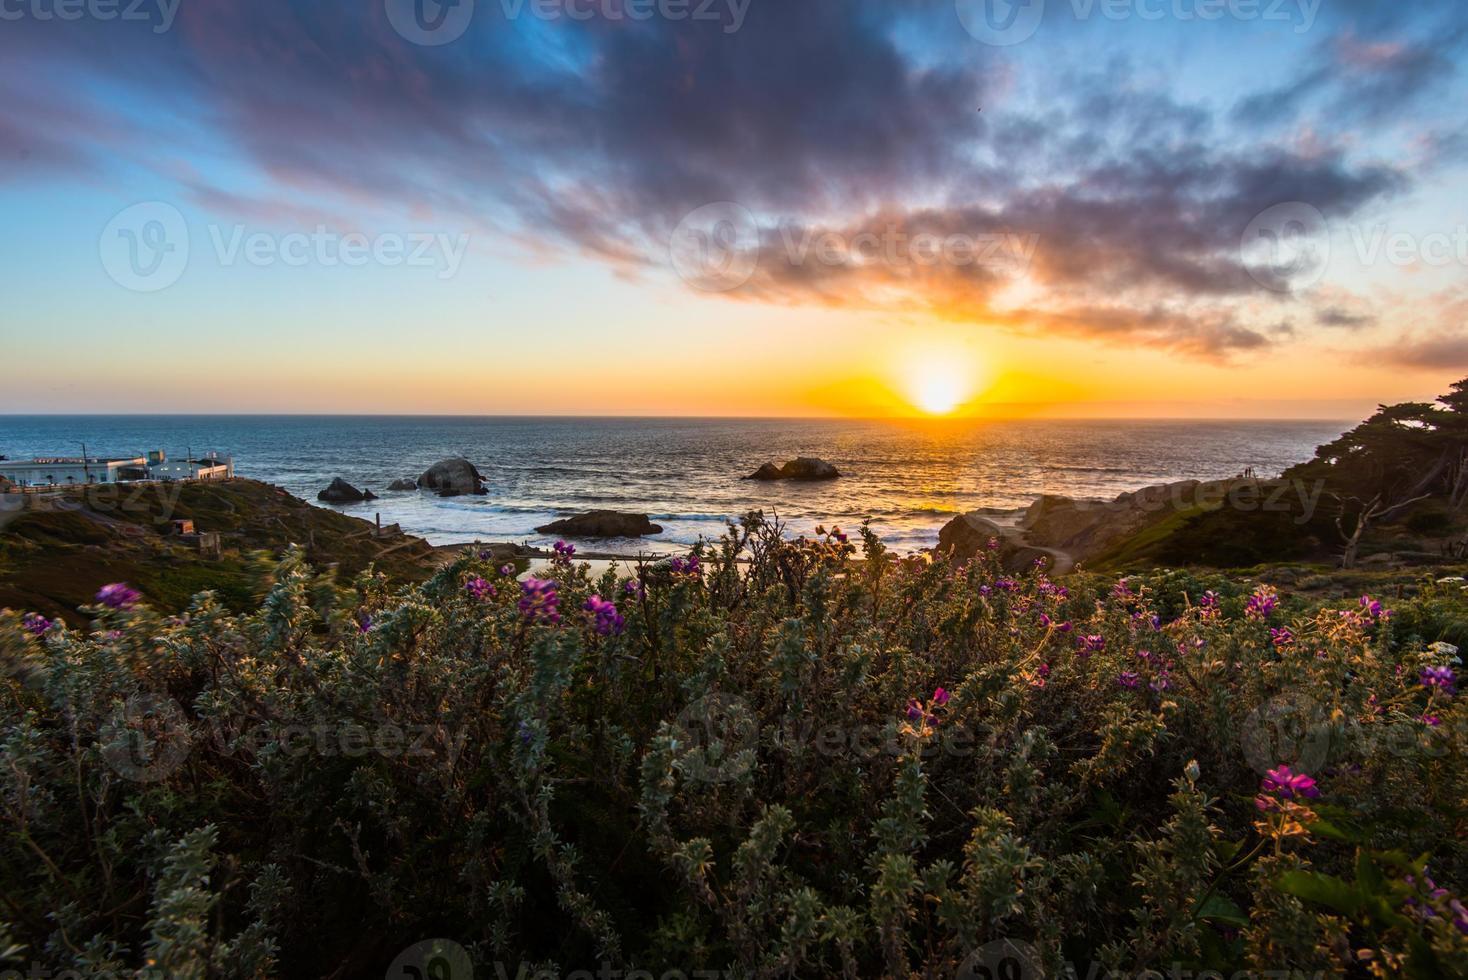 Ocean Beach Sunset photo